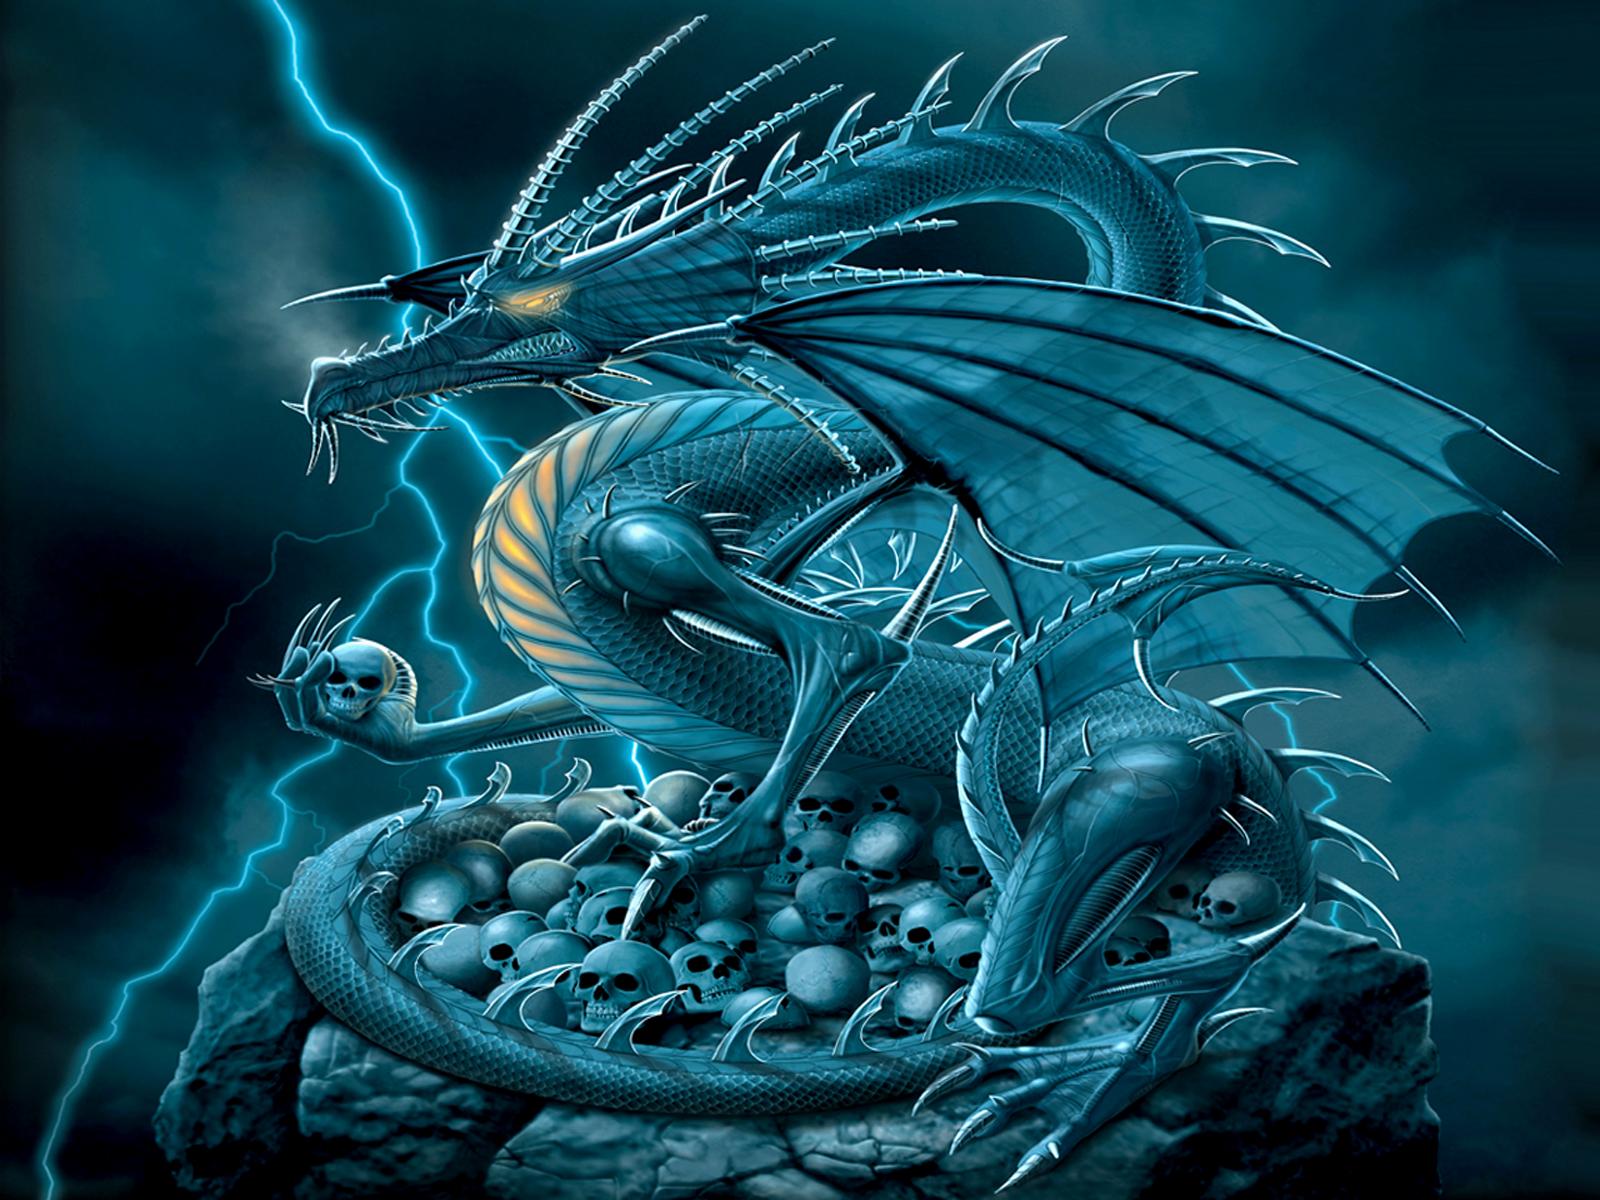 Free Download Pics Photos Dragon Wallpaper Background 1600x1200